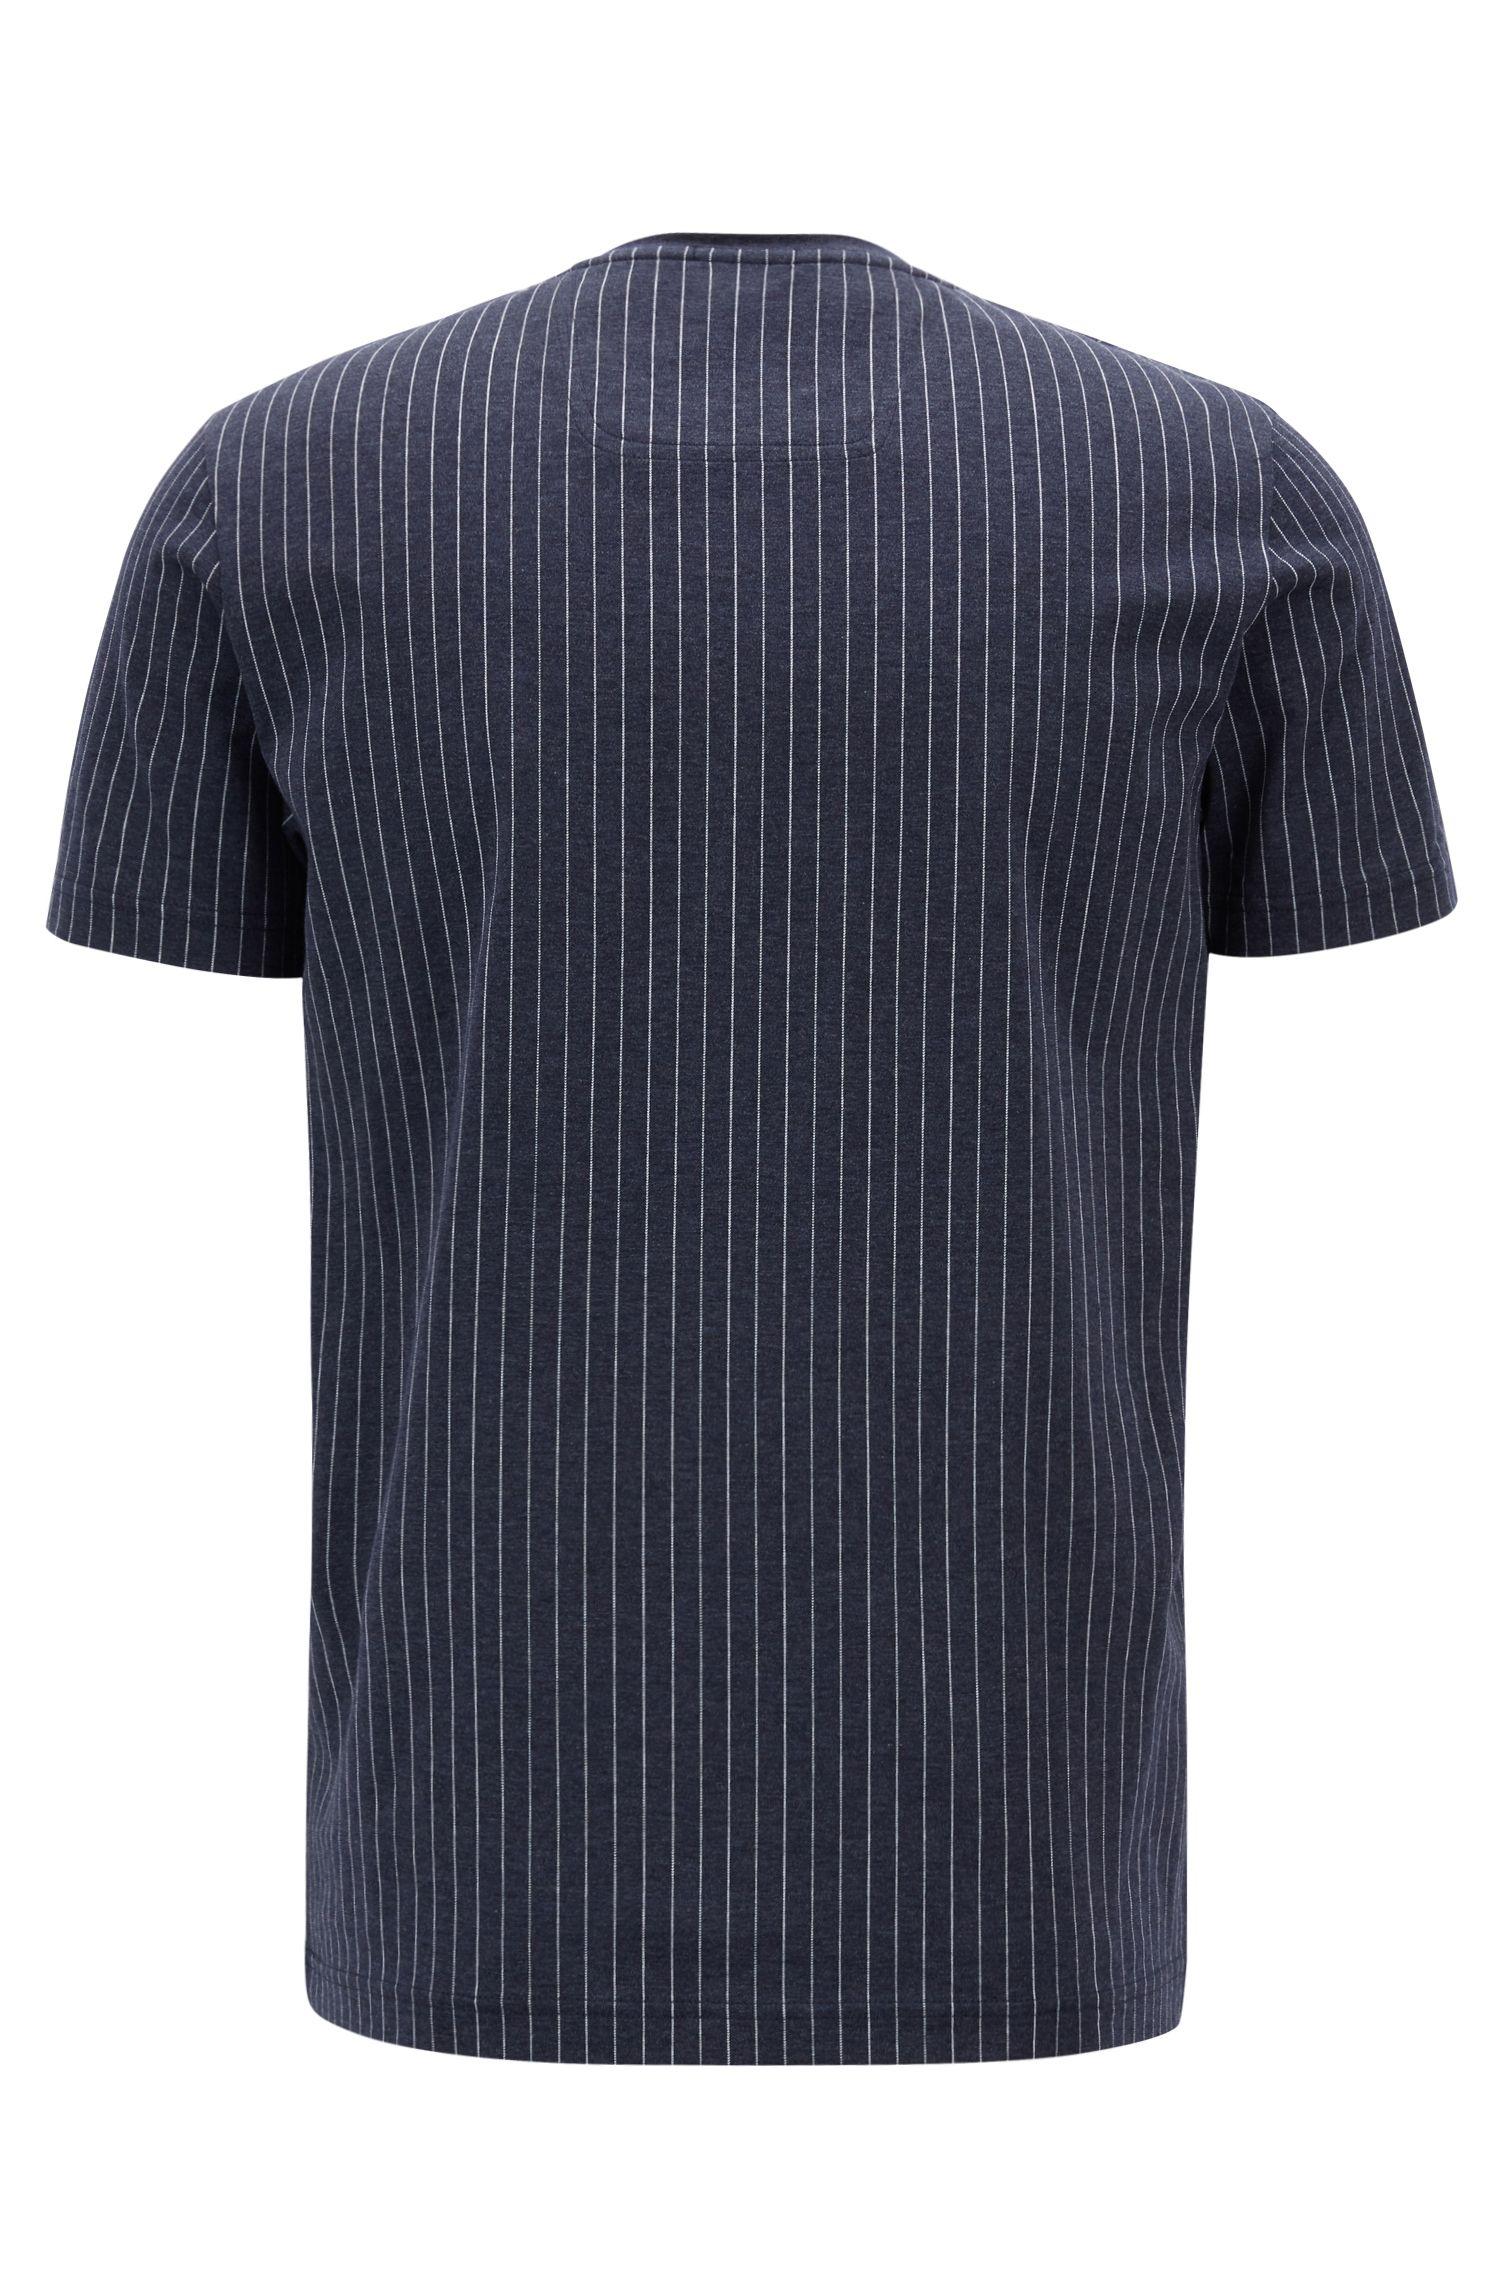 Pinstripe T-shirt in mercerised cotton with flock-print logo, Dark Blue